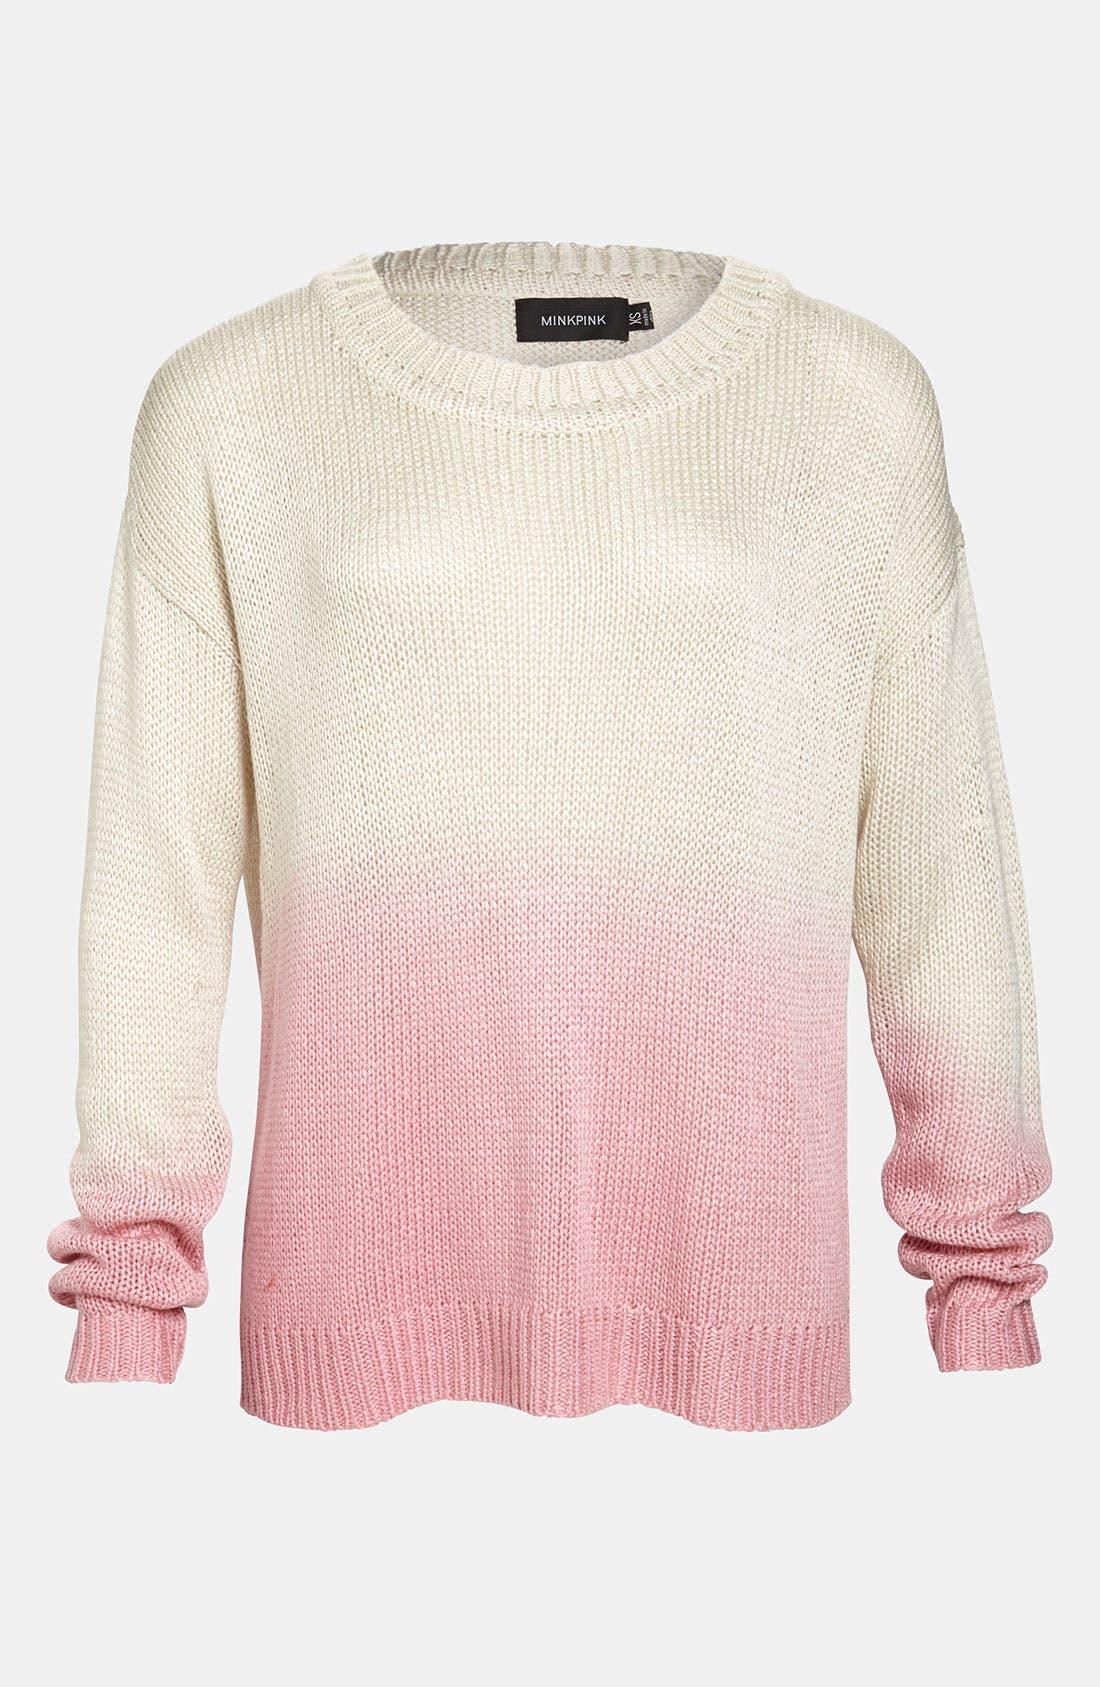 Alternate Image 1 Selected - MINKPINK 'Melting Moments' Dip Dye Sweater